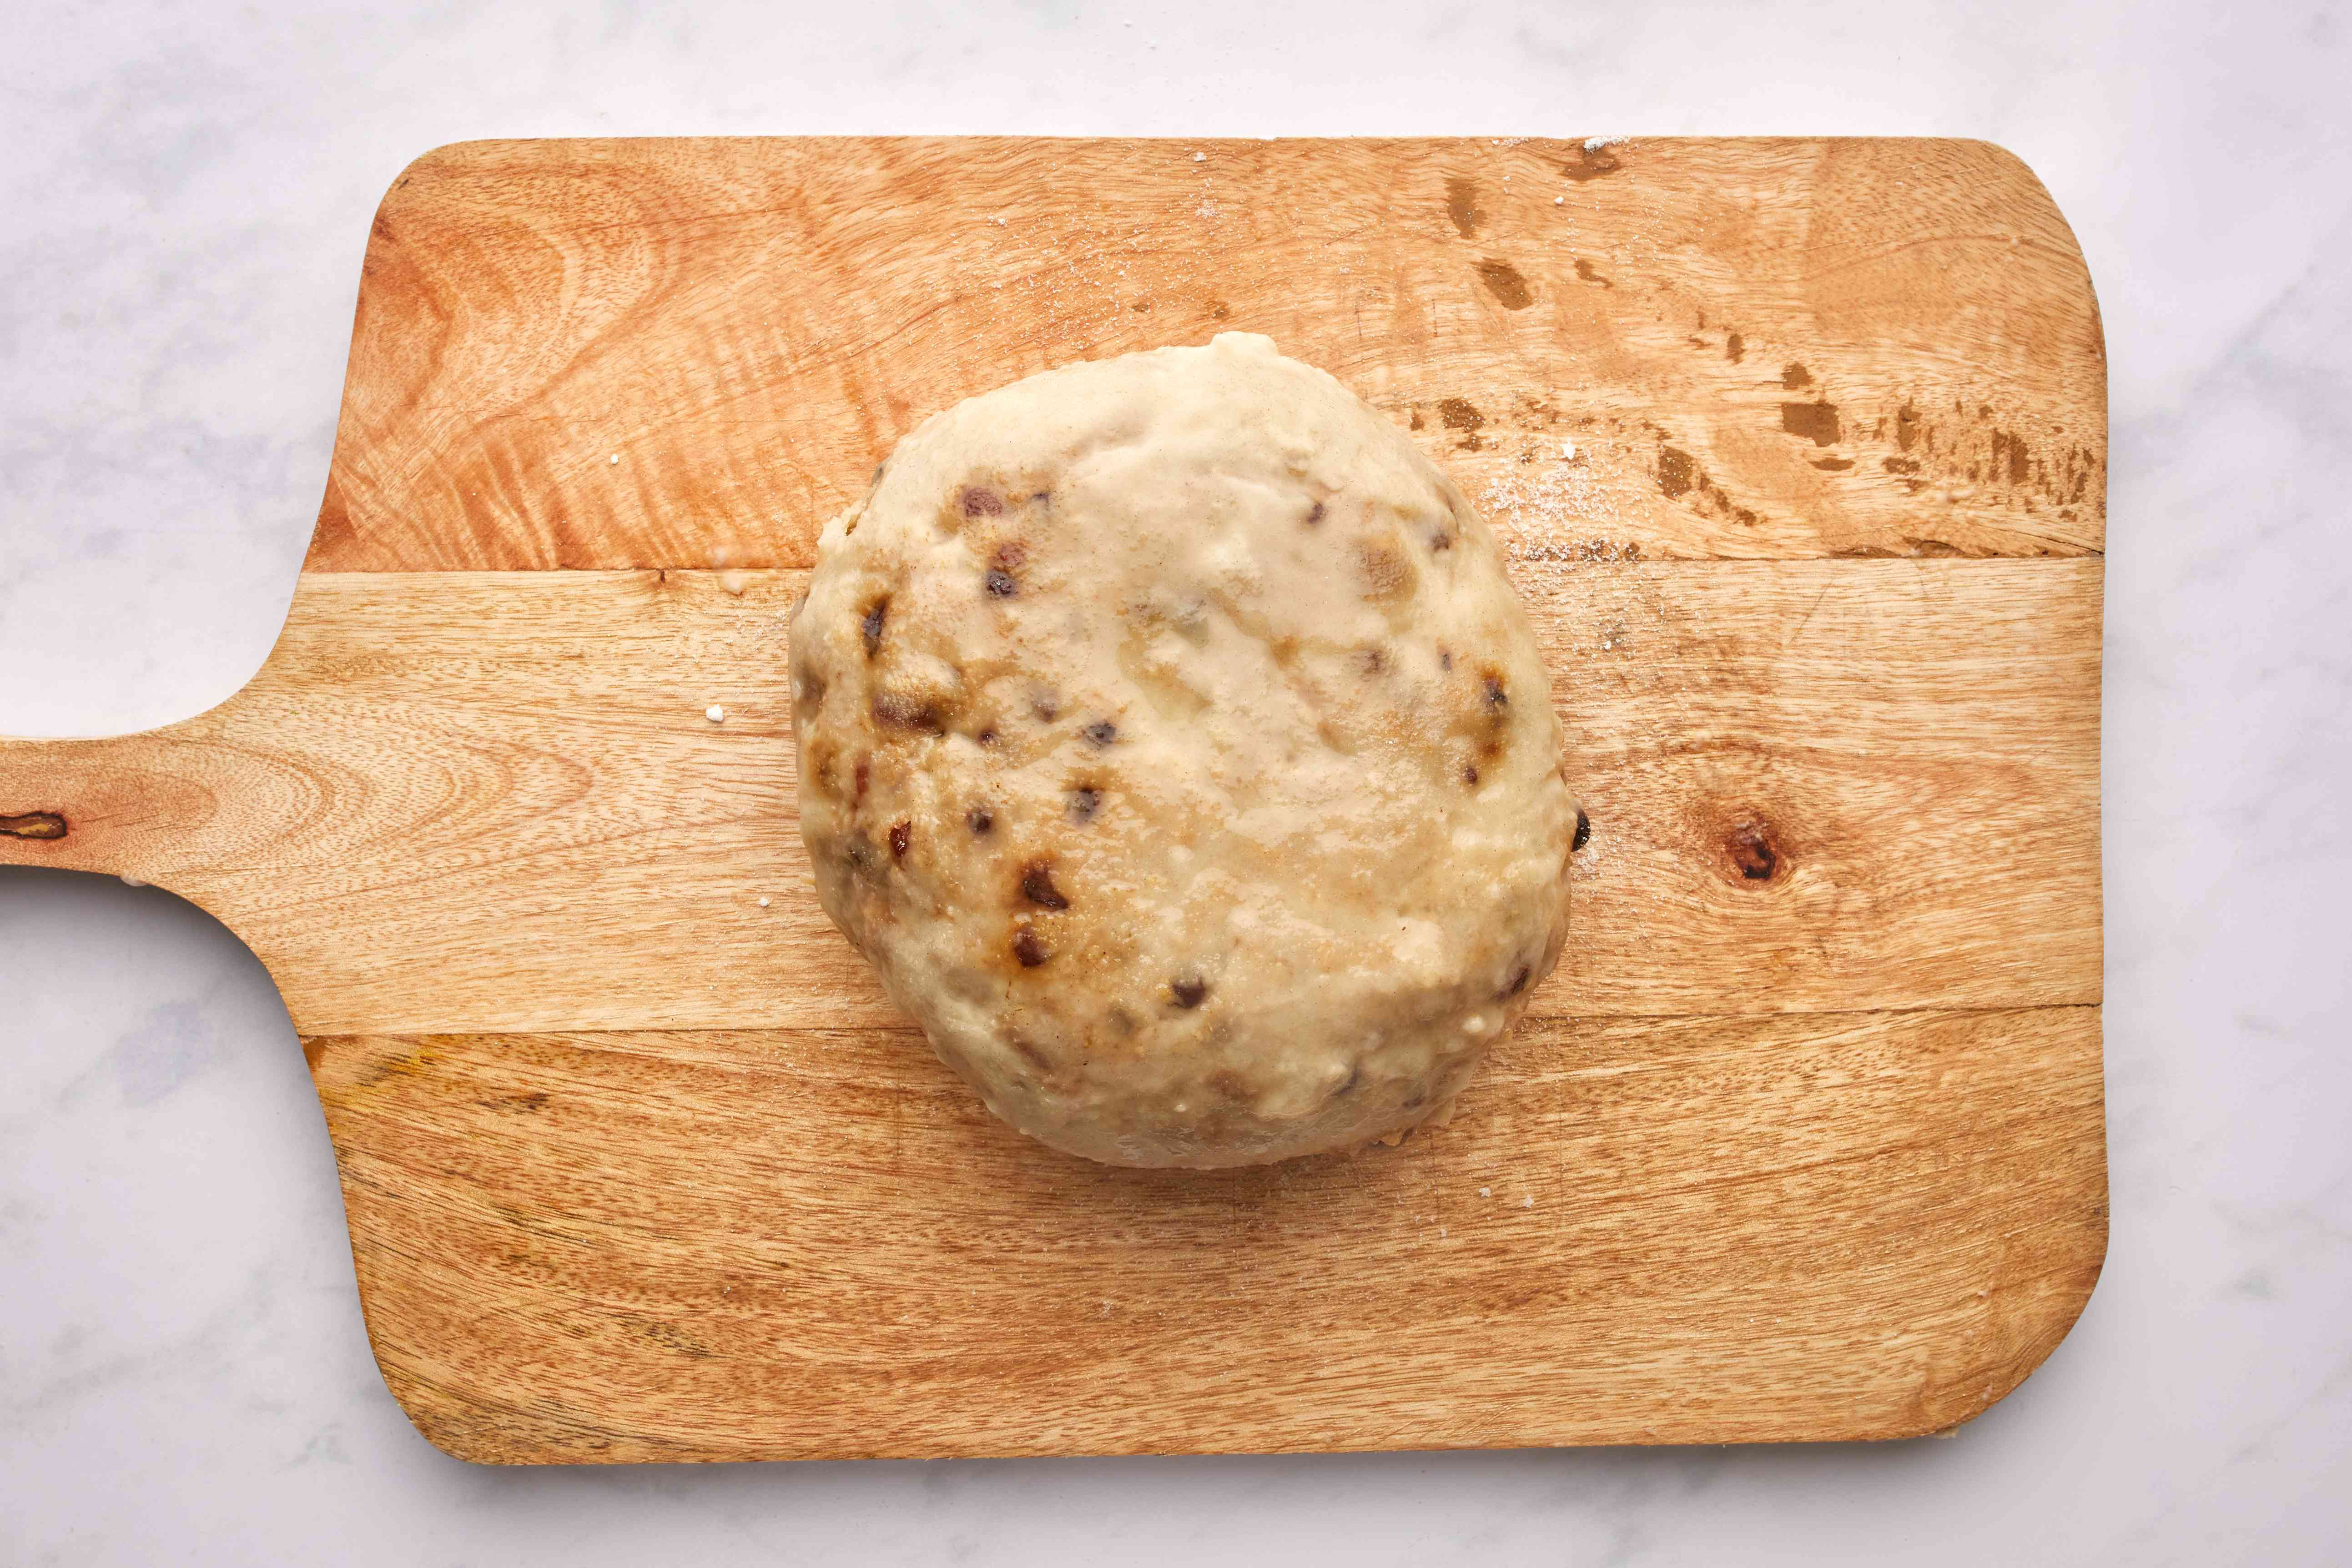 Clootie dumpling with caster sugar sprinkled on top